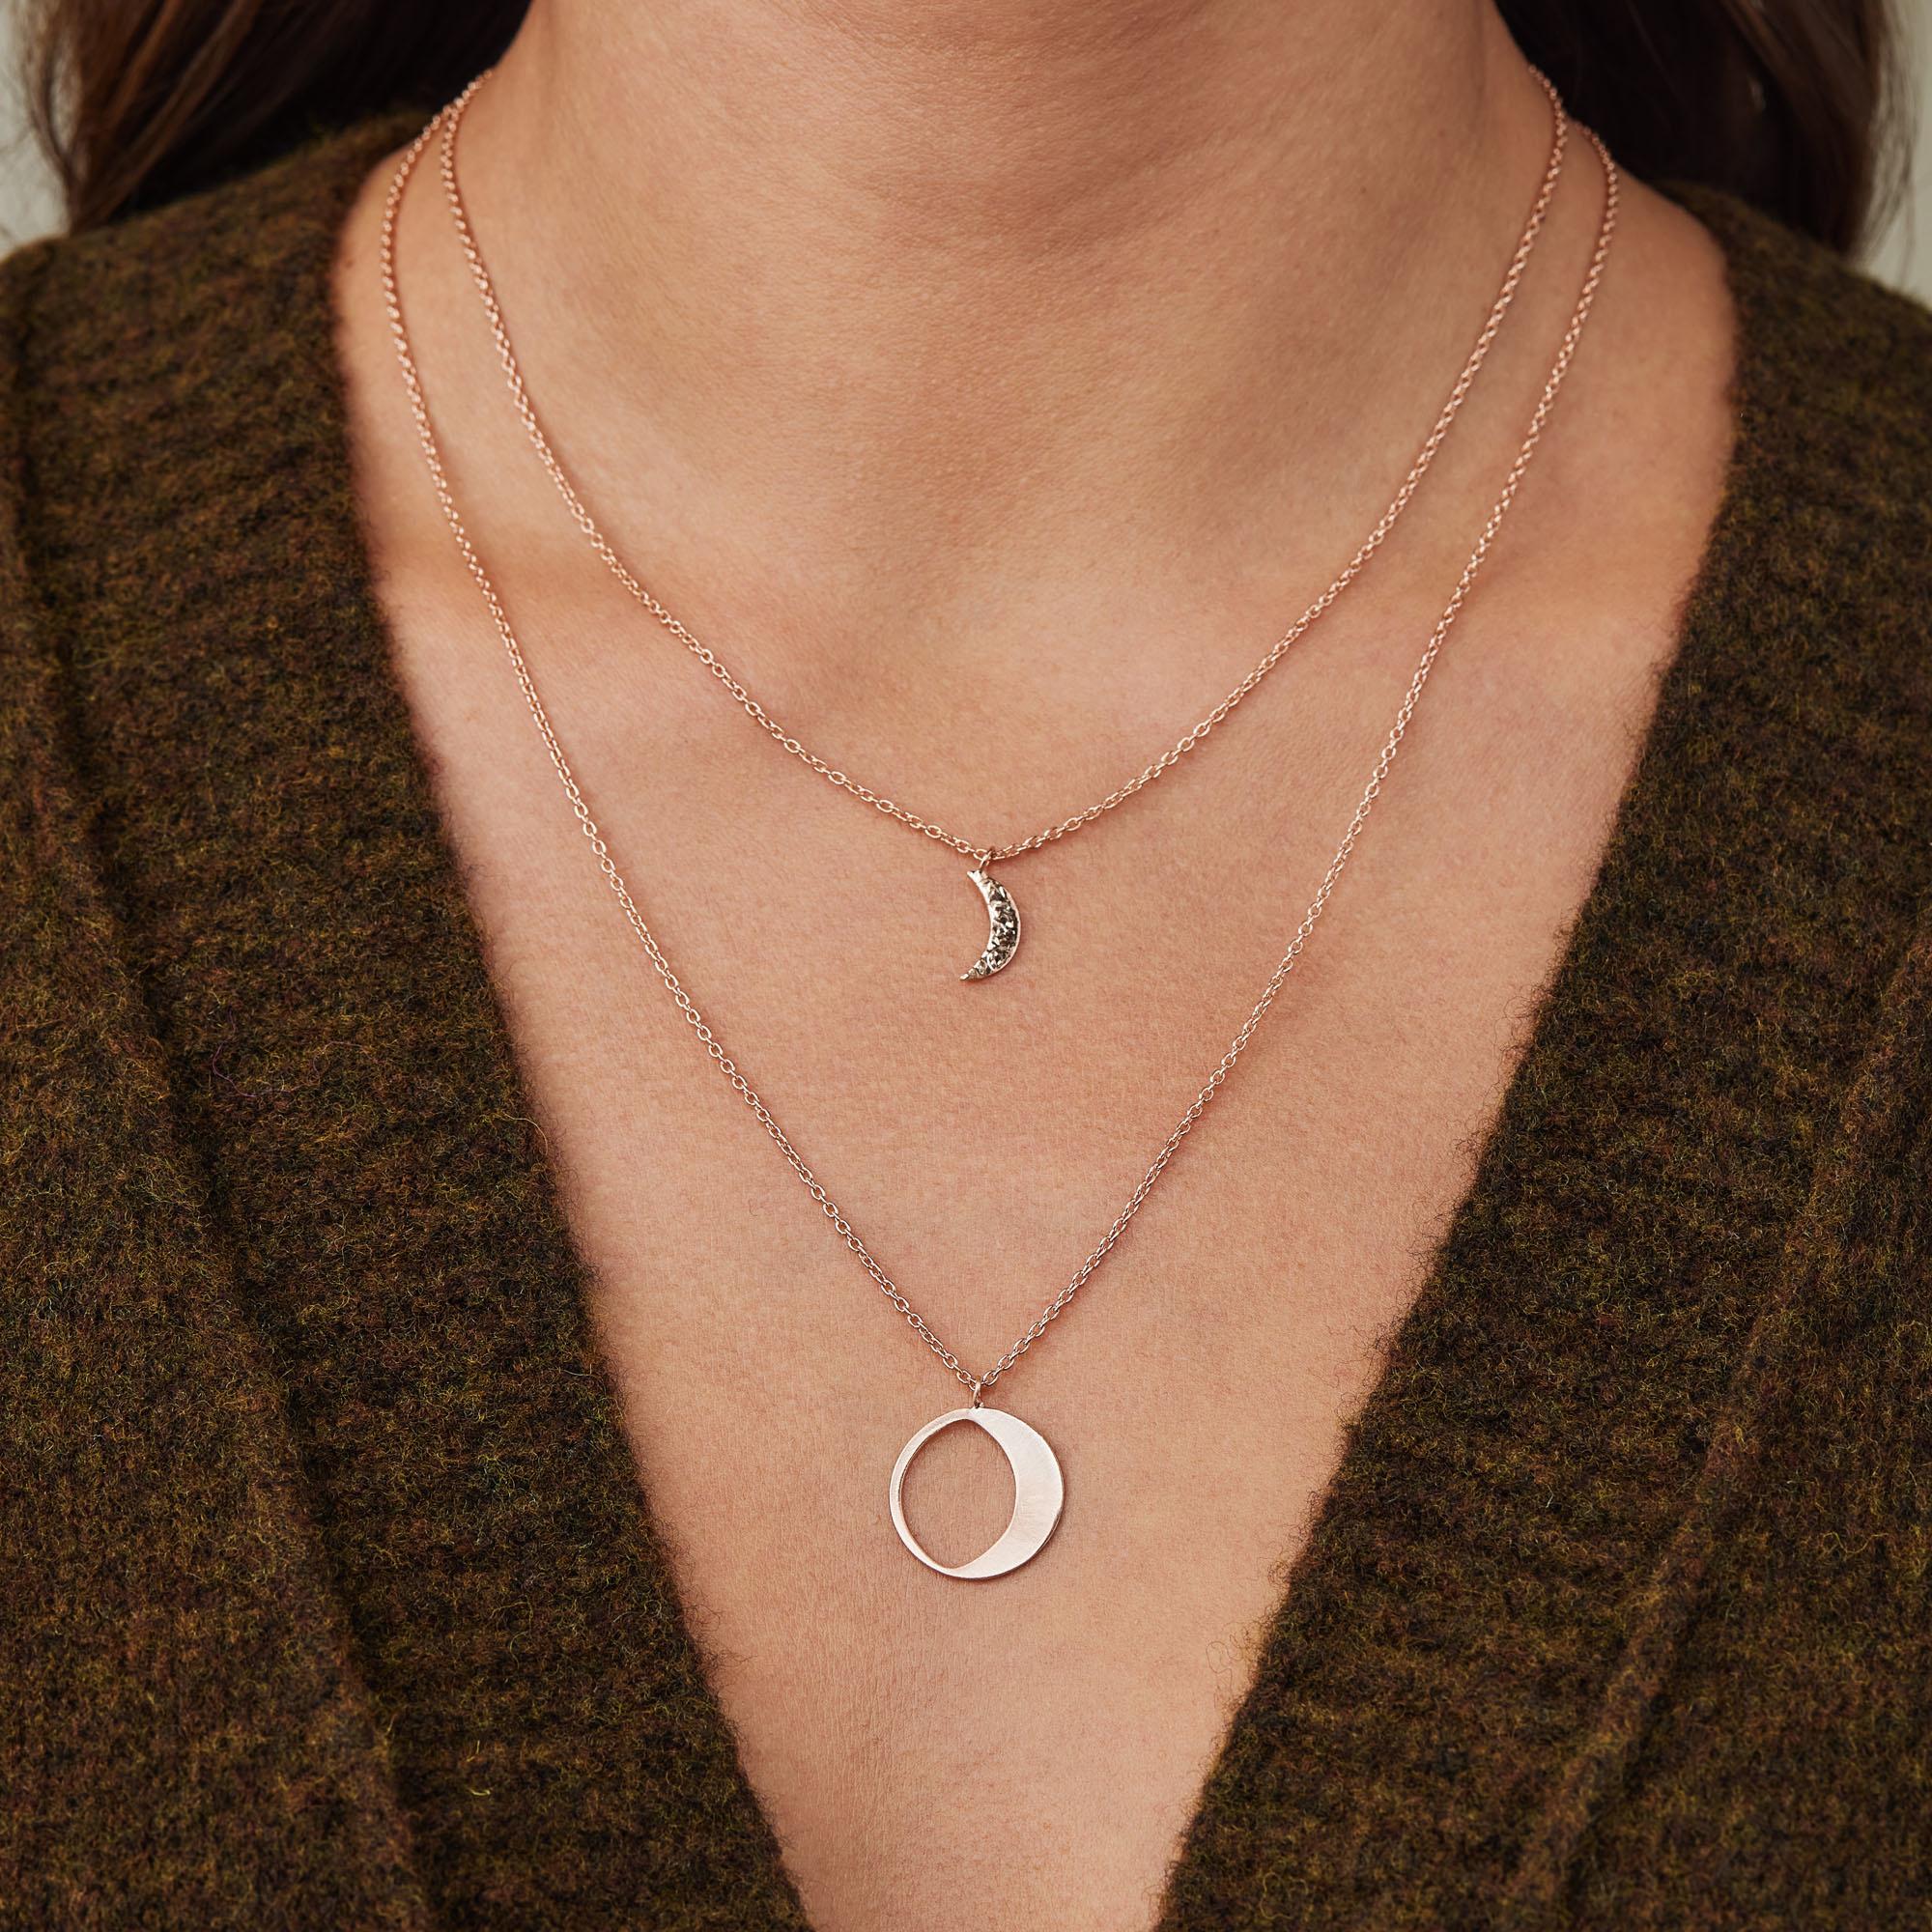 Violet Hamden Luna 925 sterling silver rose gold colored necklace with moons